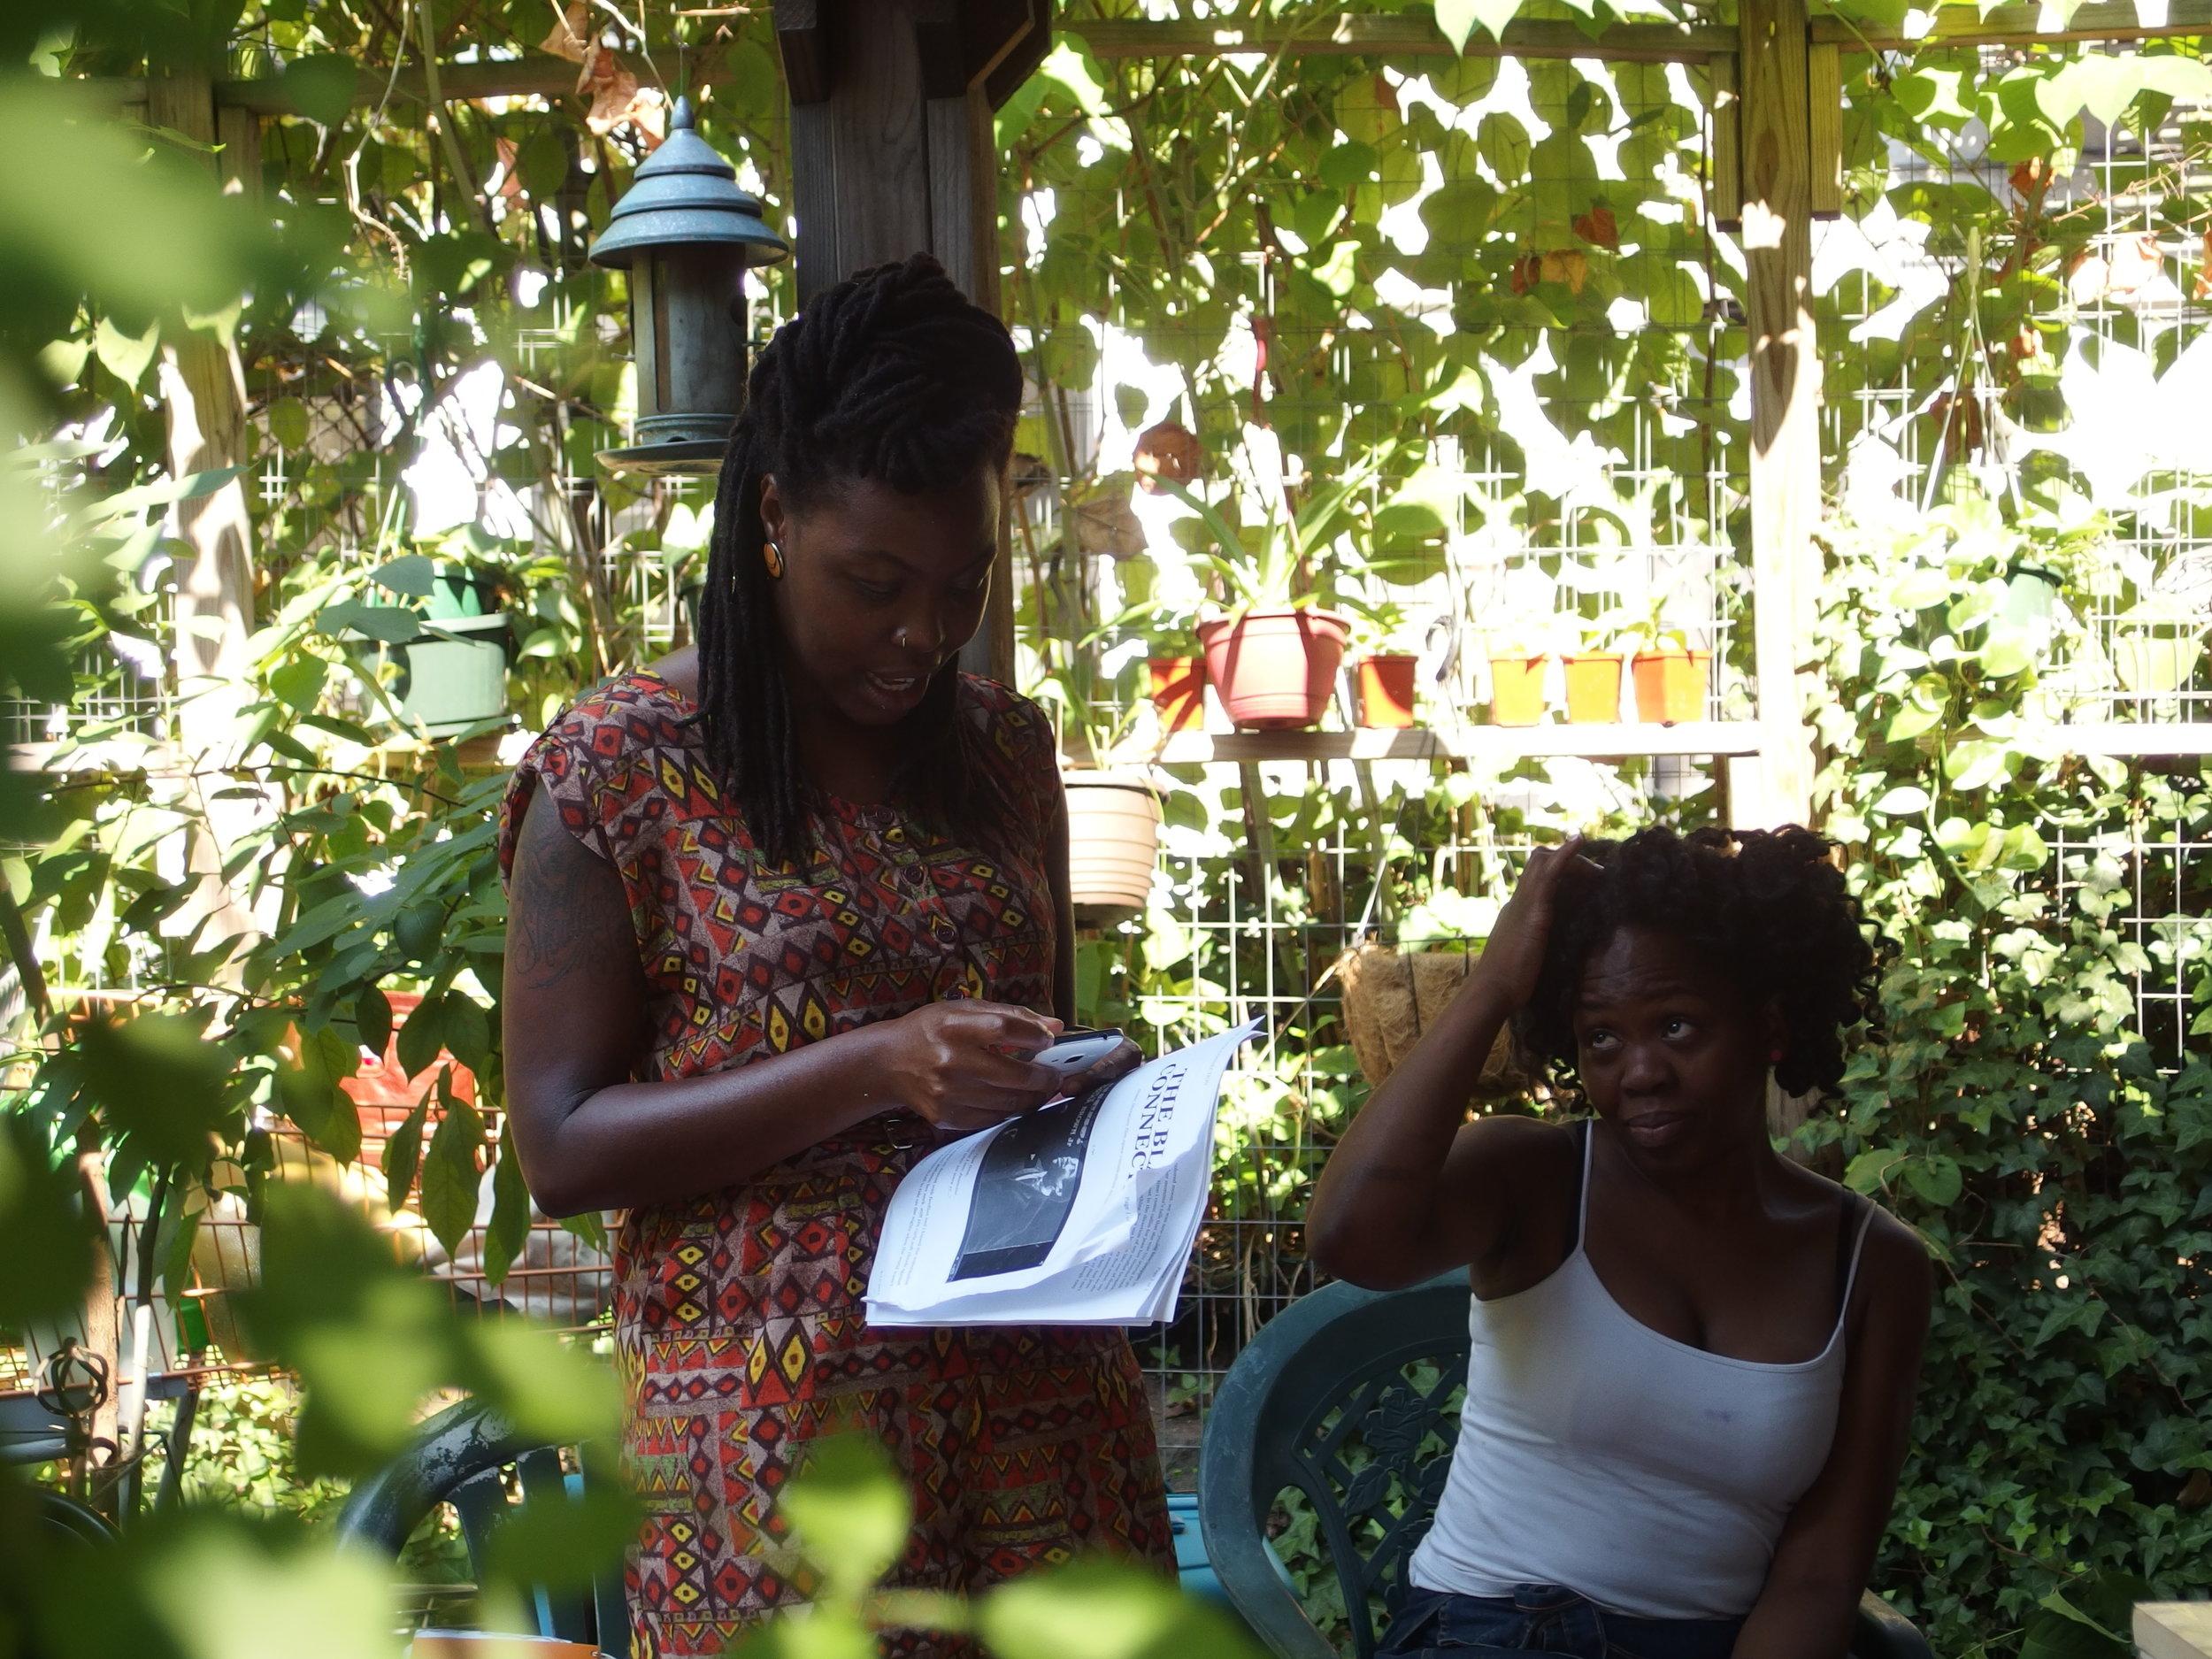 little-free-black-womens-library_20763047890_o.jpg